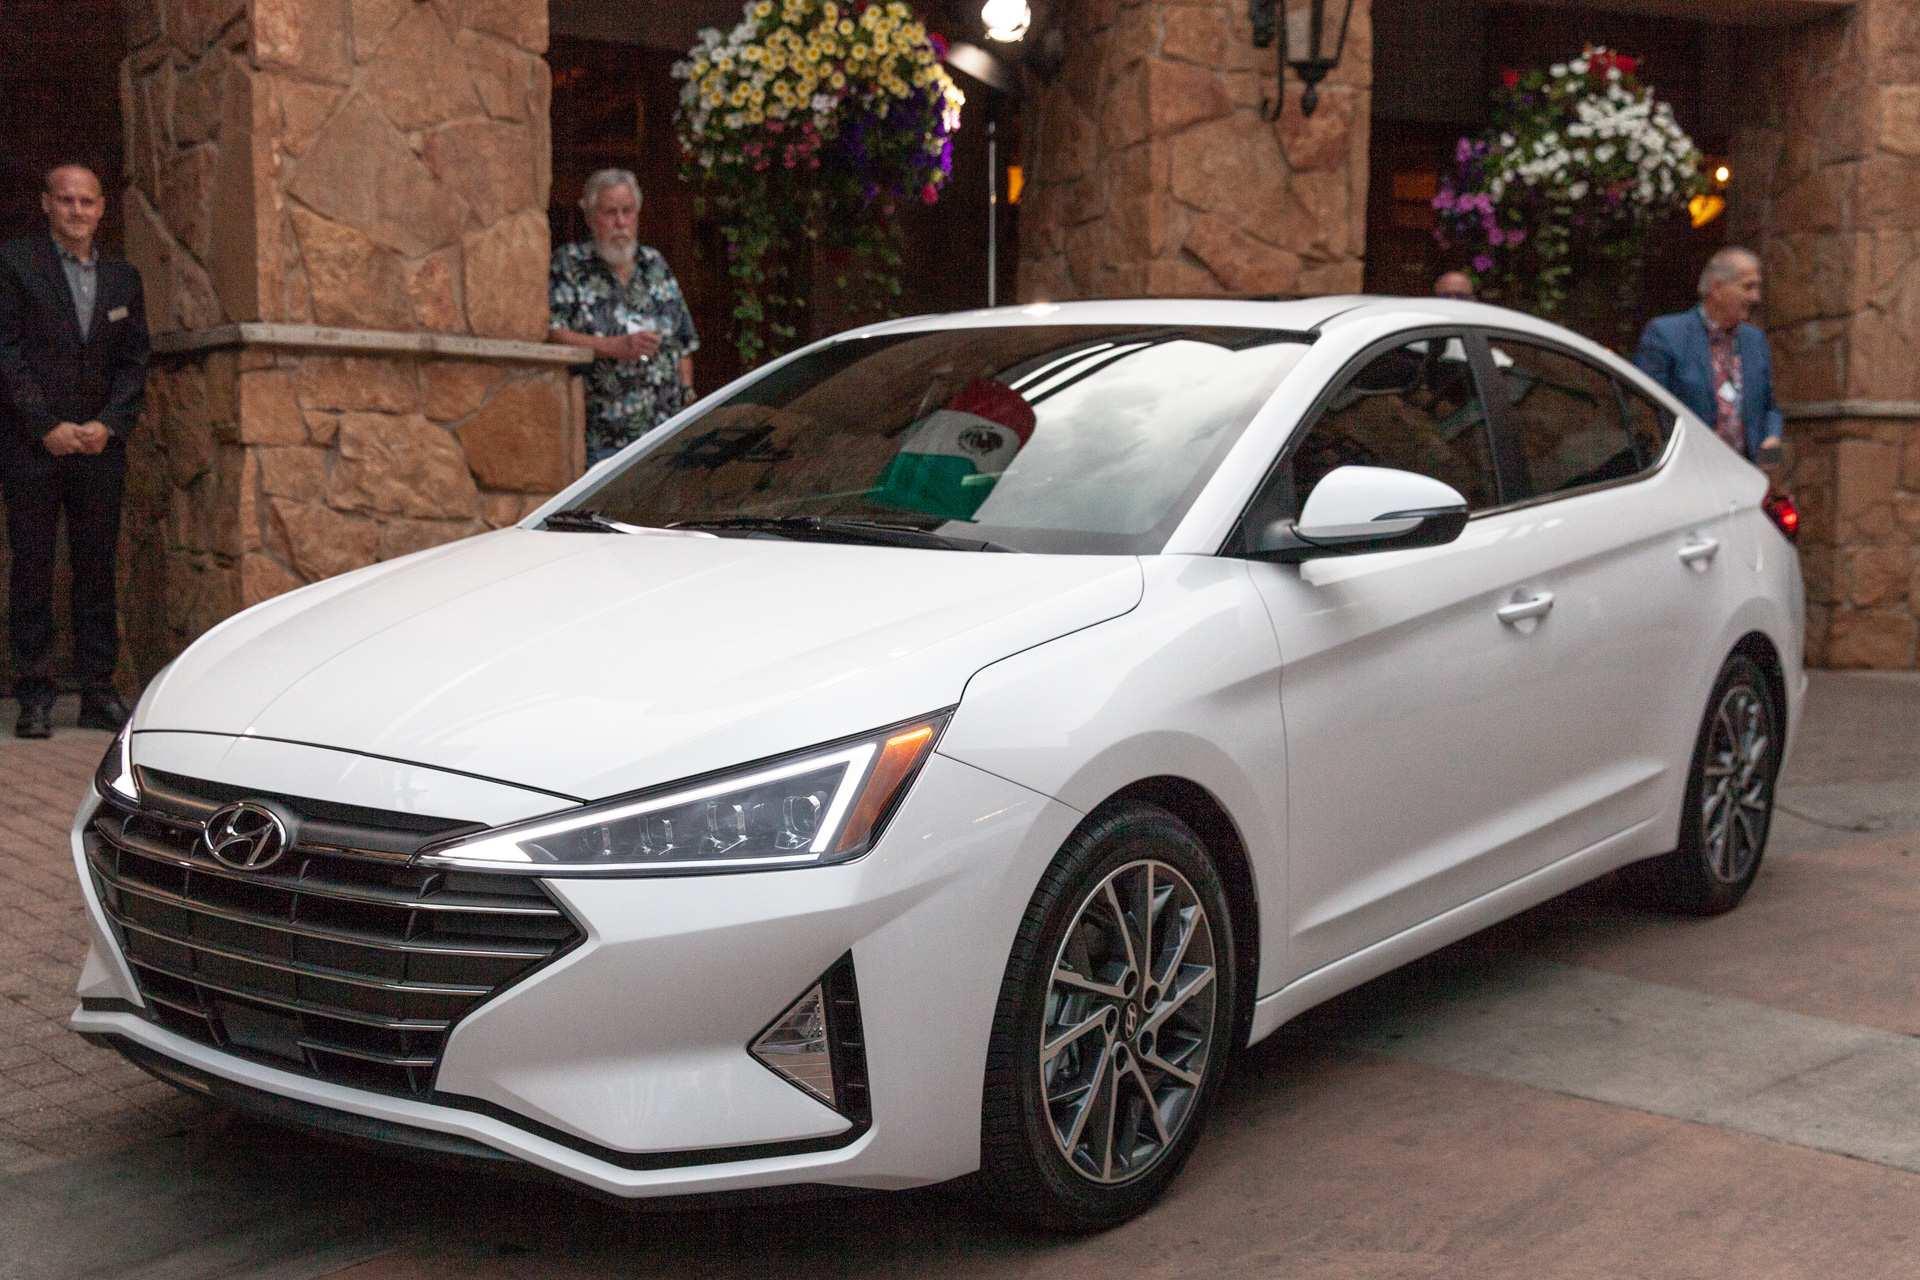 99 New 2019 Hyundai Elantra Release with 2019 Hyundai Elantra